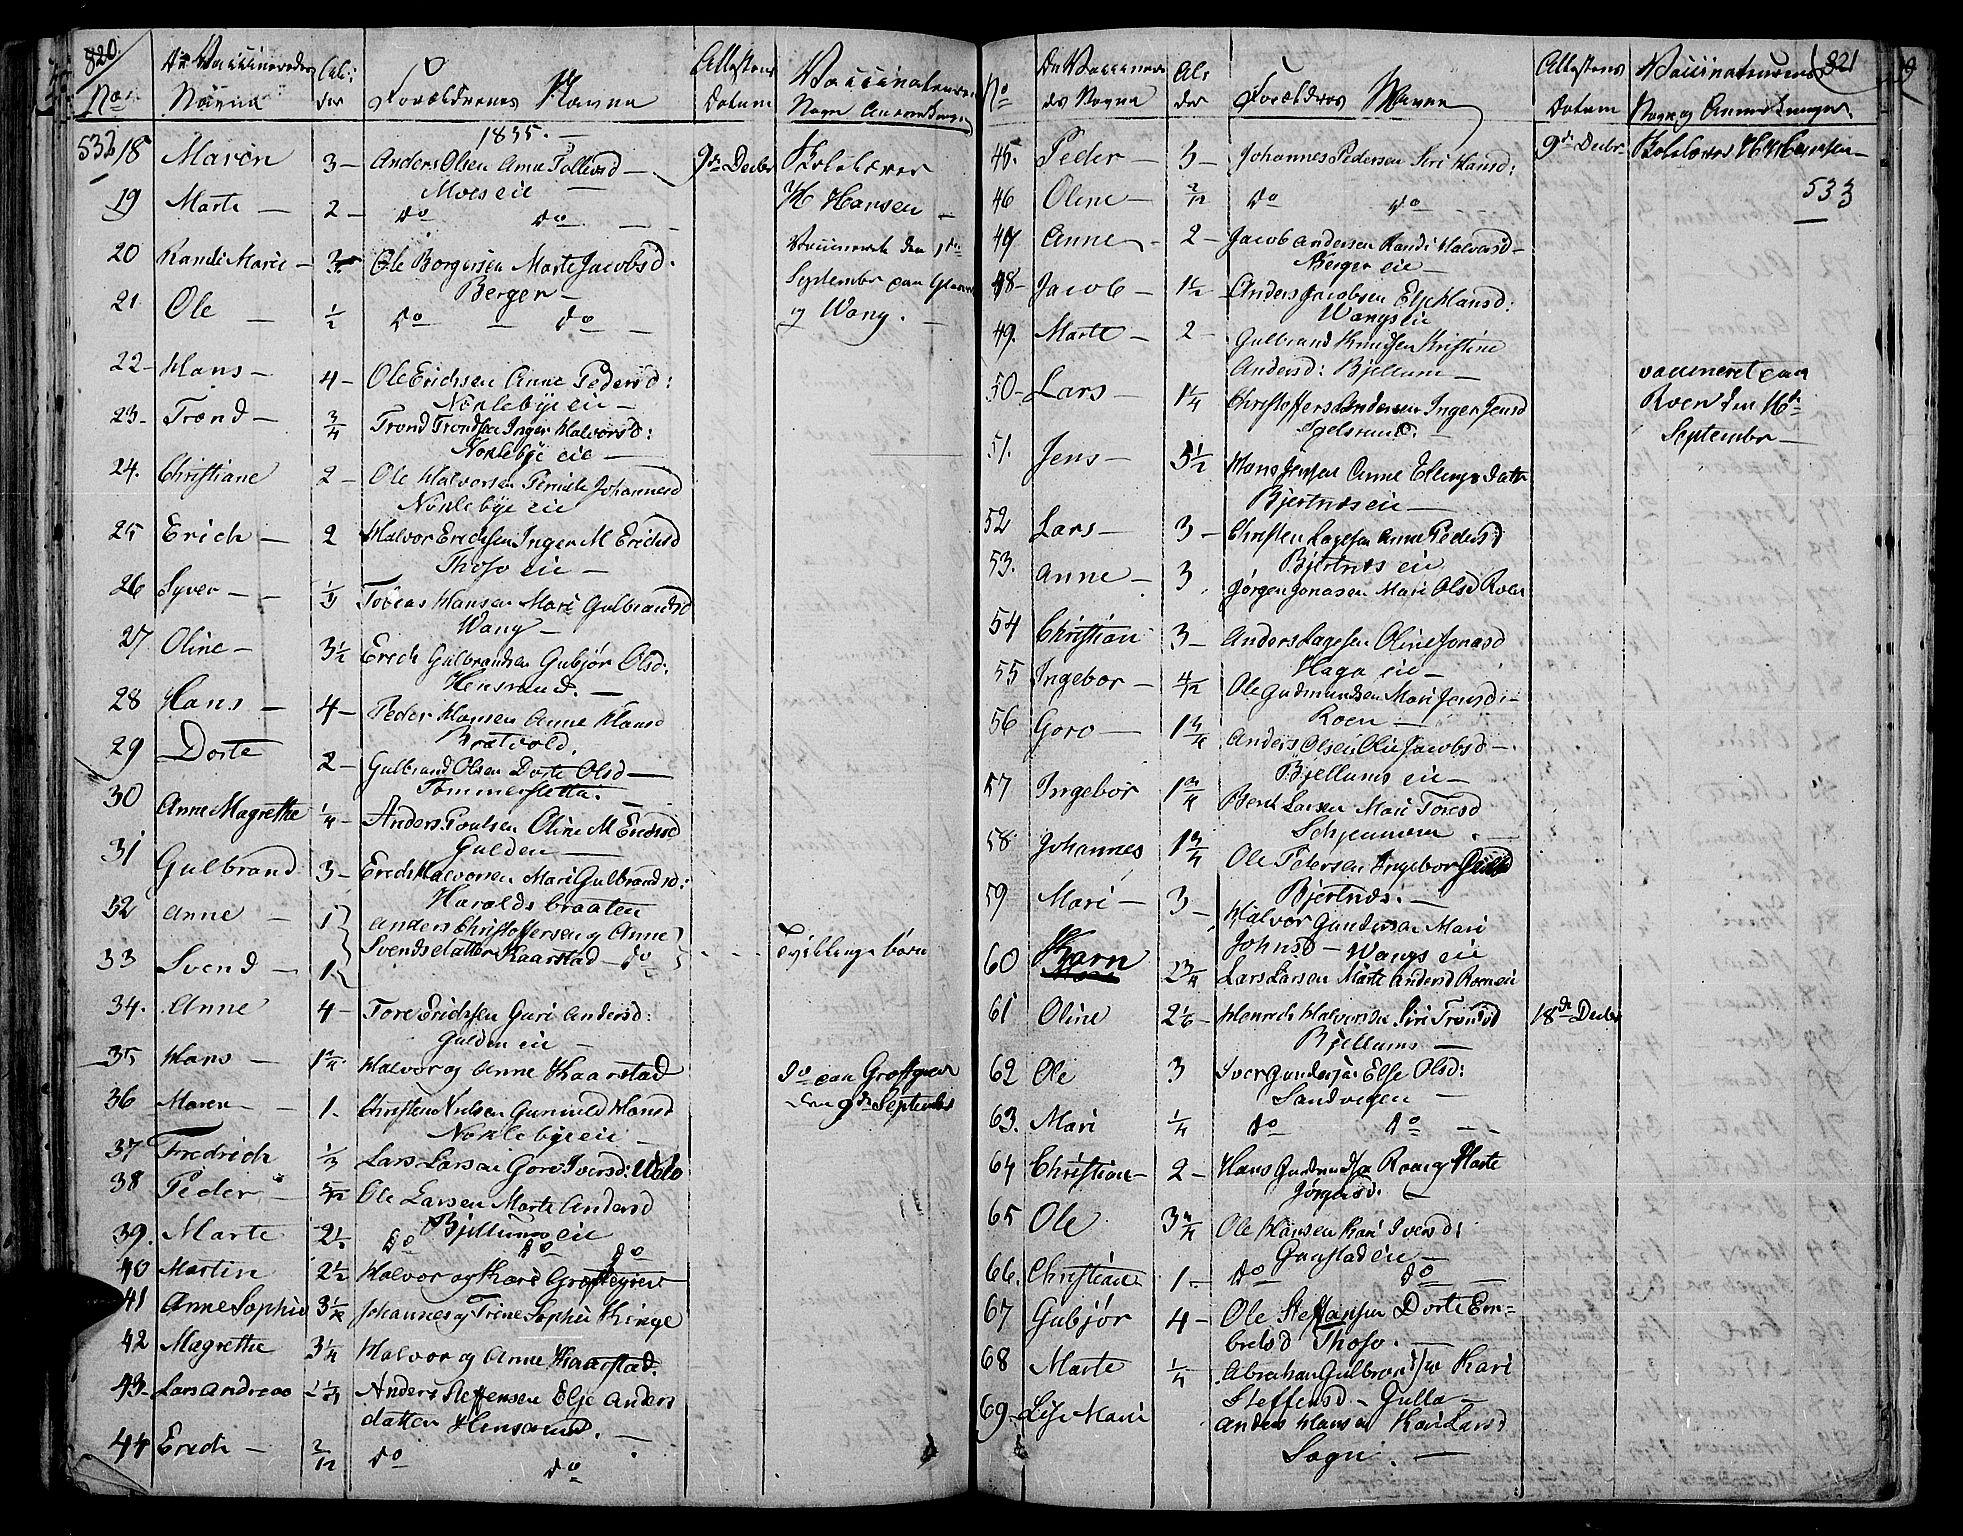 SAH, Jevnaker prestekontor, Ministerialbok nr. 4, 1800-1861, s. 532-533